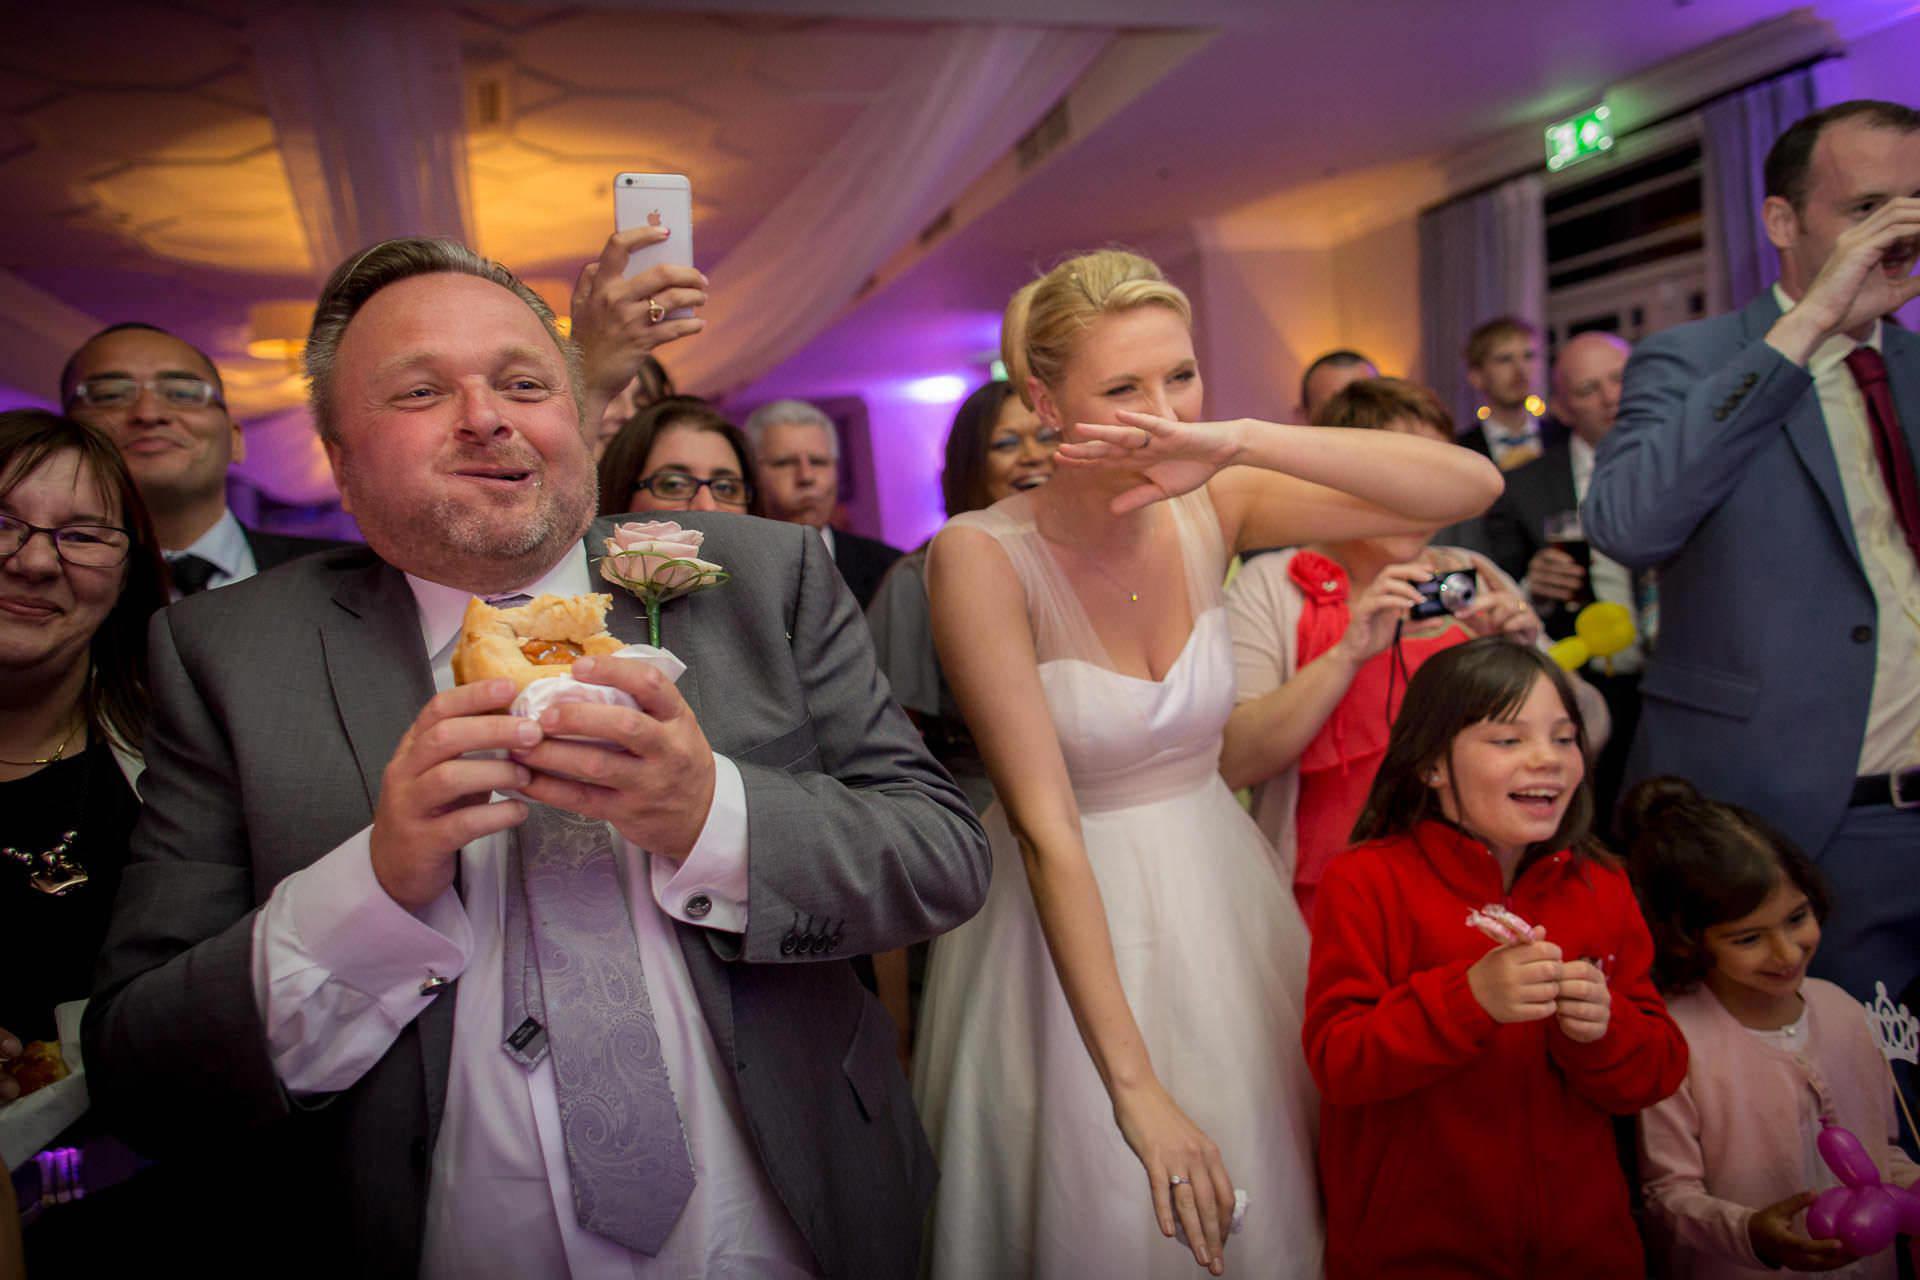 Wotton House wedding geusts watch performance